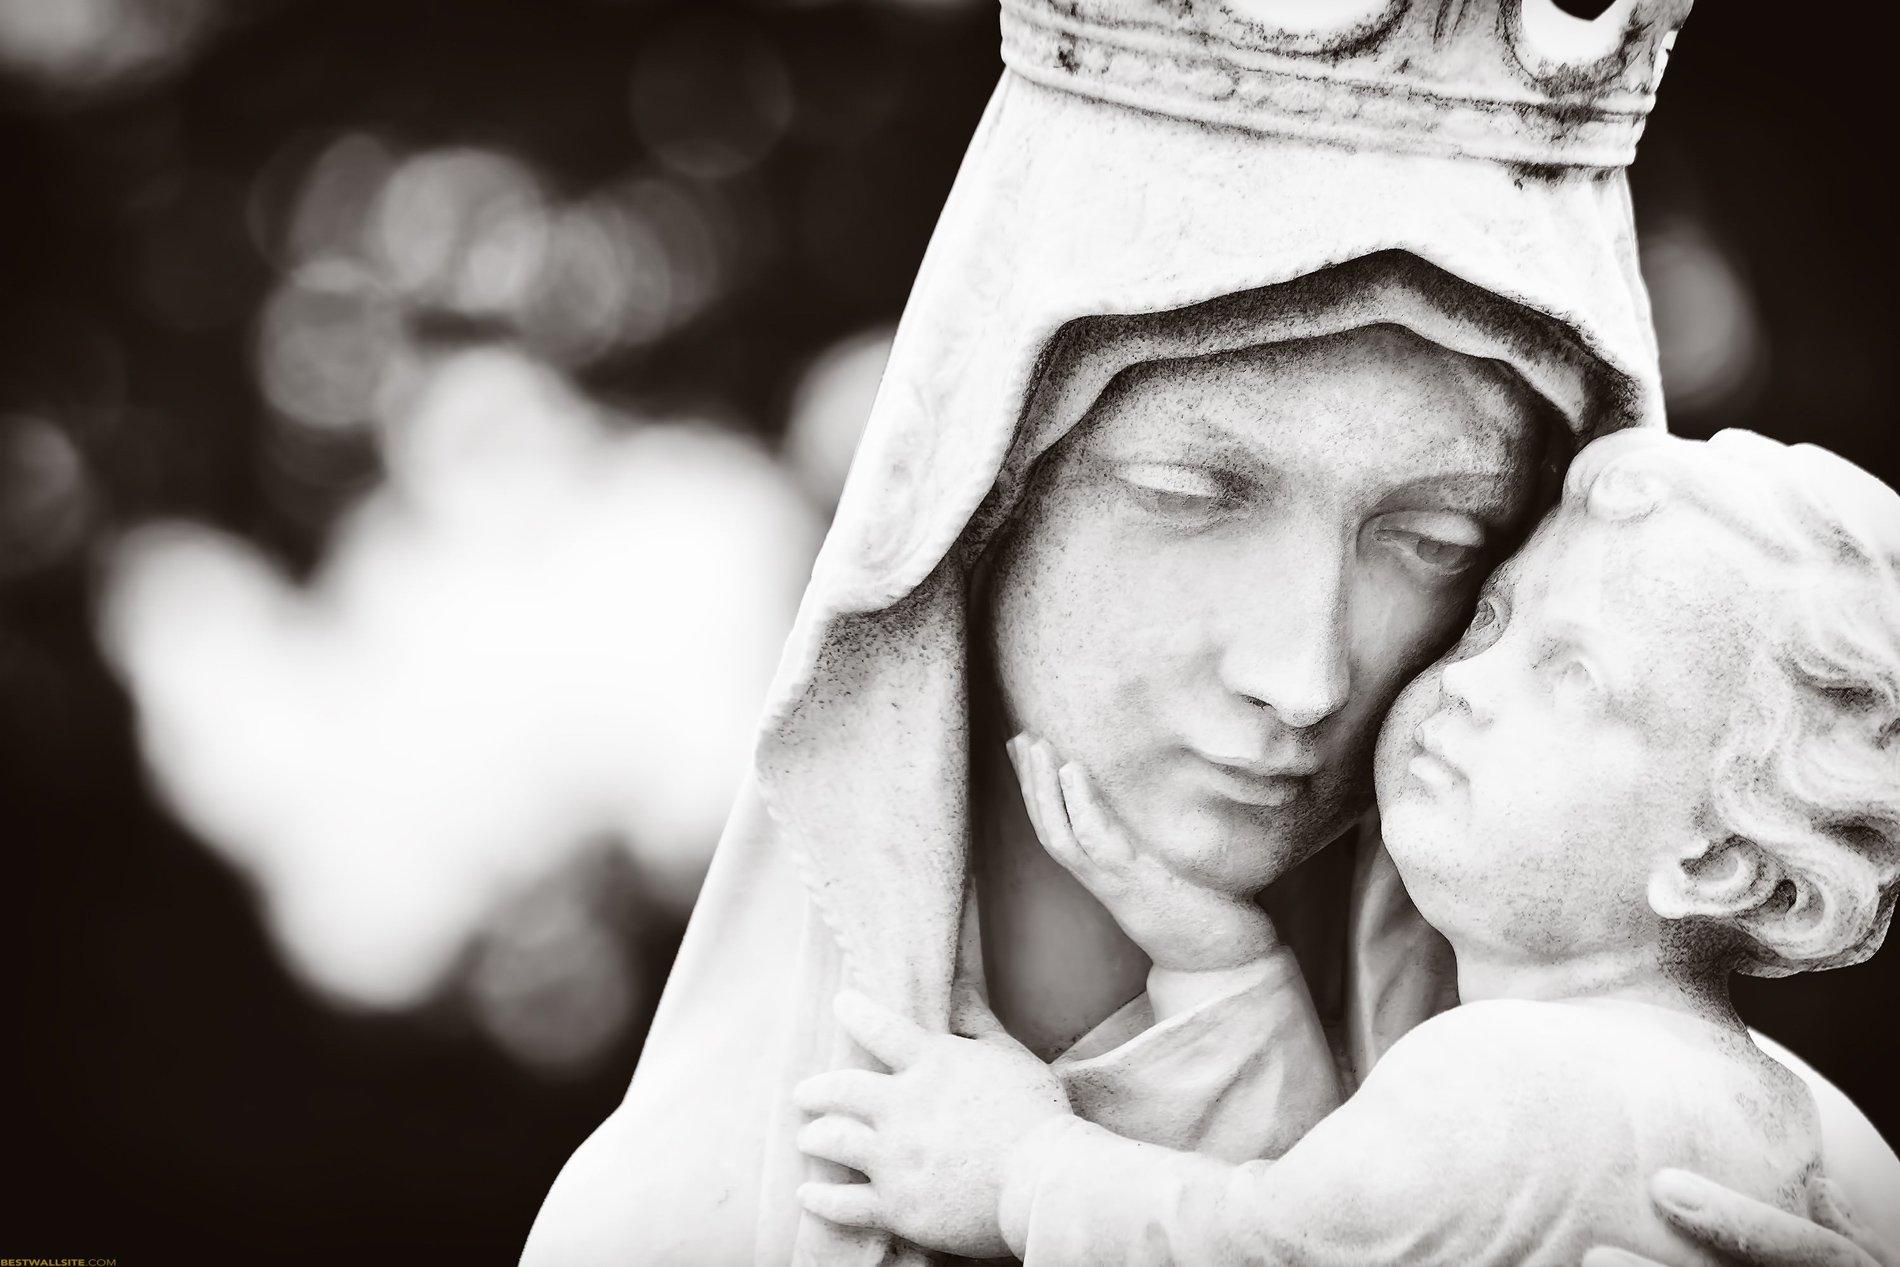 irenaeus incarnation emmanuel advent december 19 born for us of the virgin